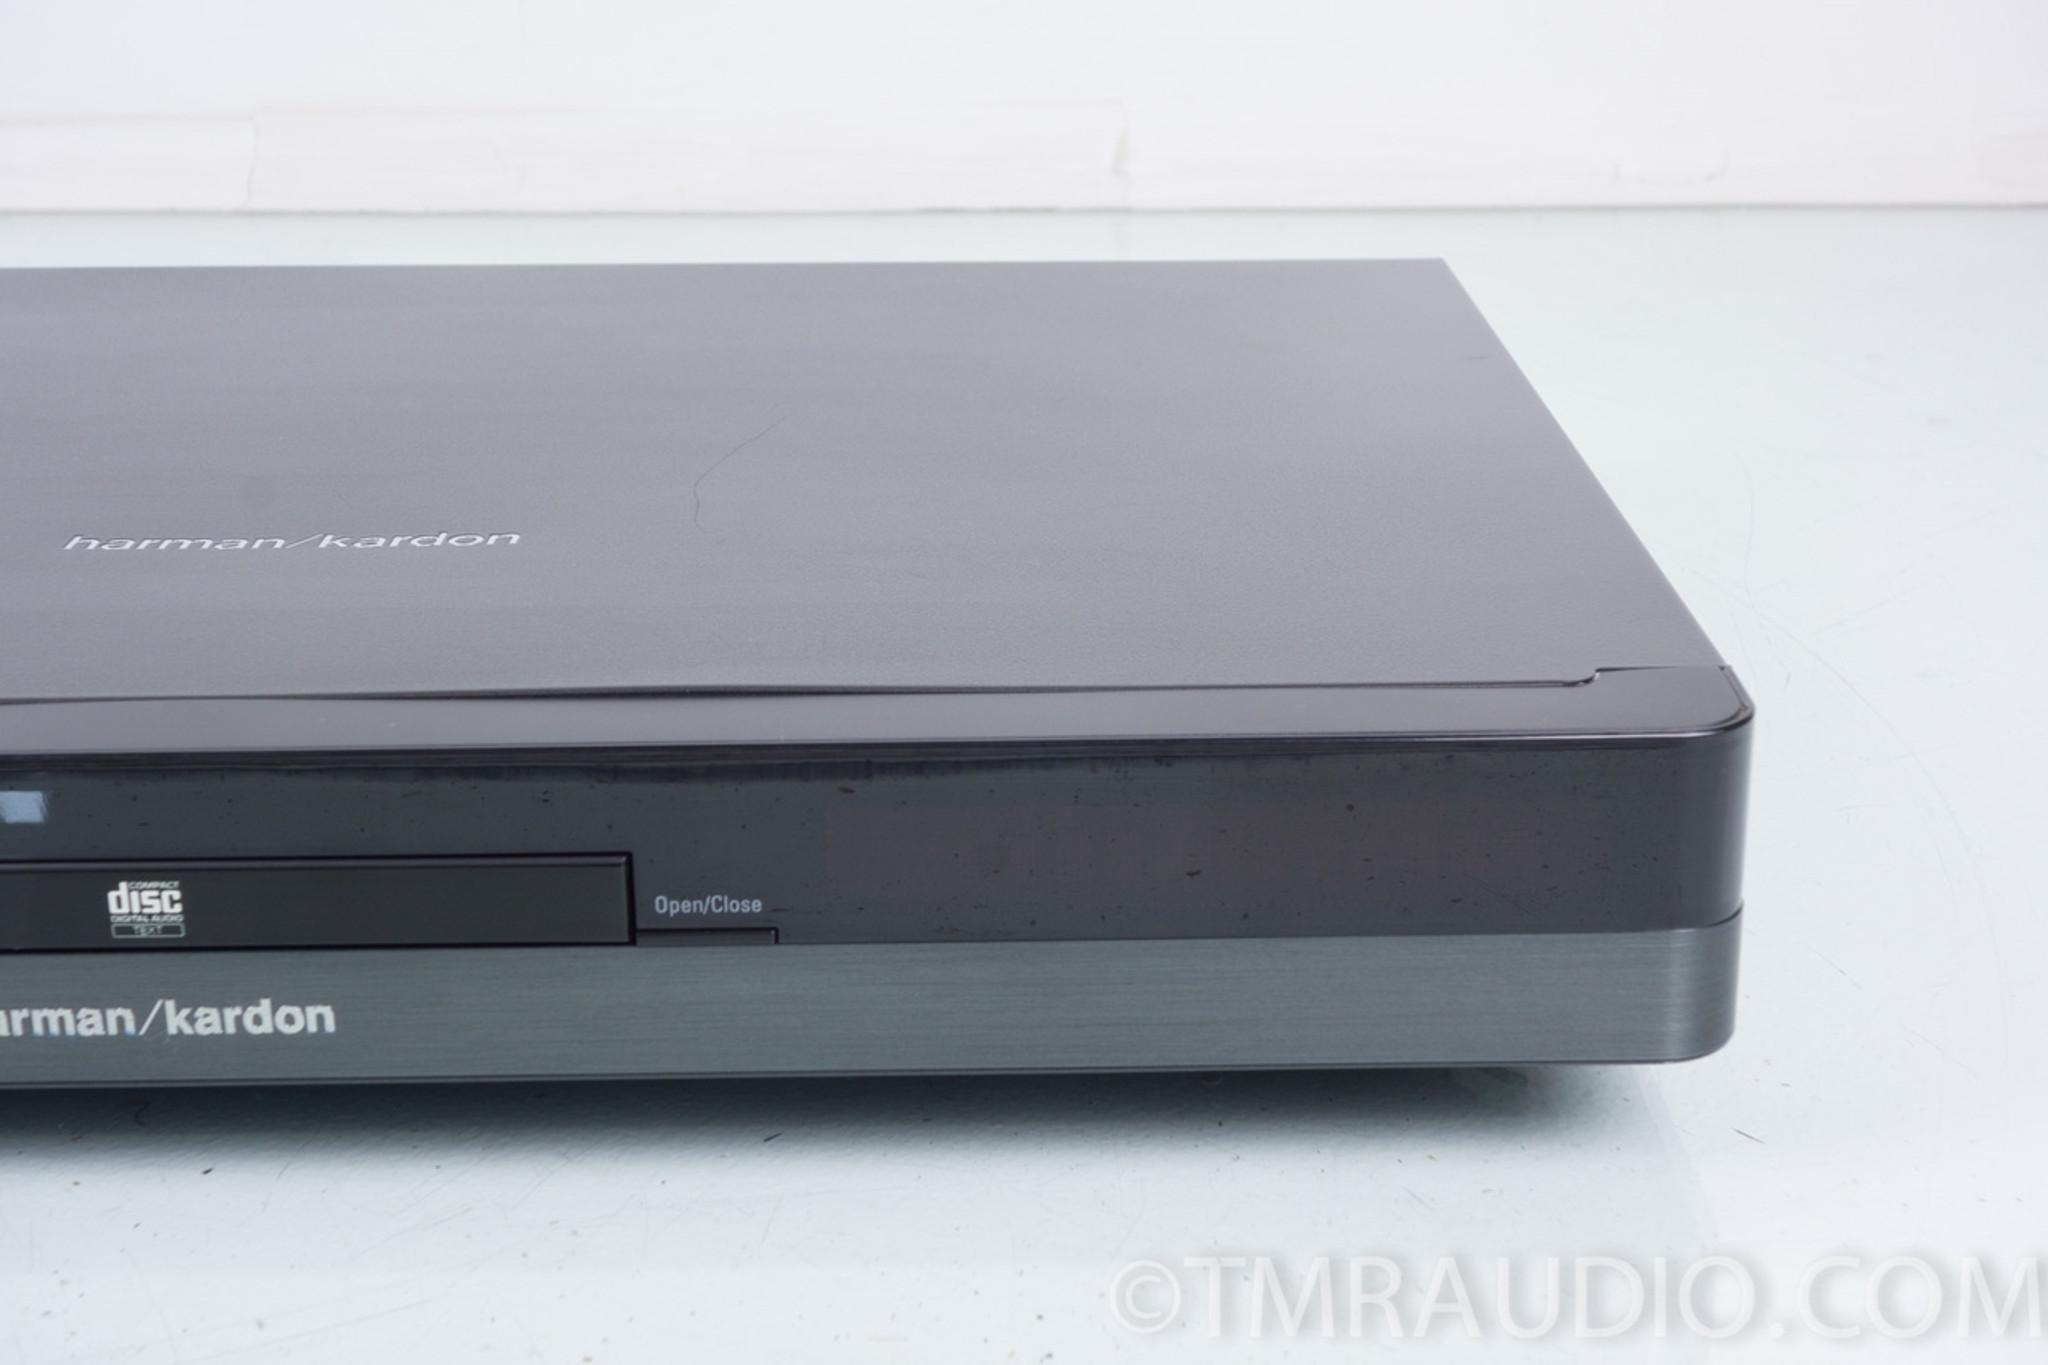 Harman Kardon HD 990 CD Player